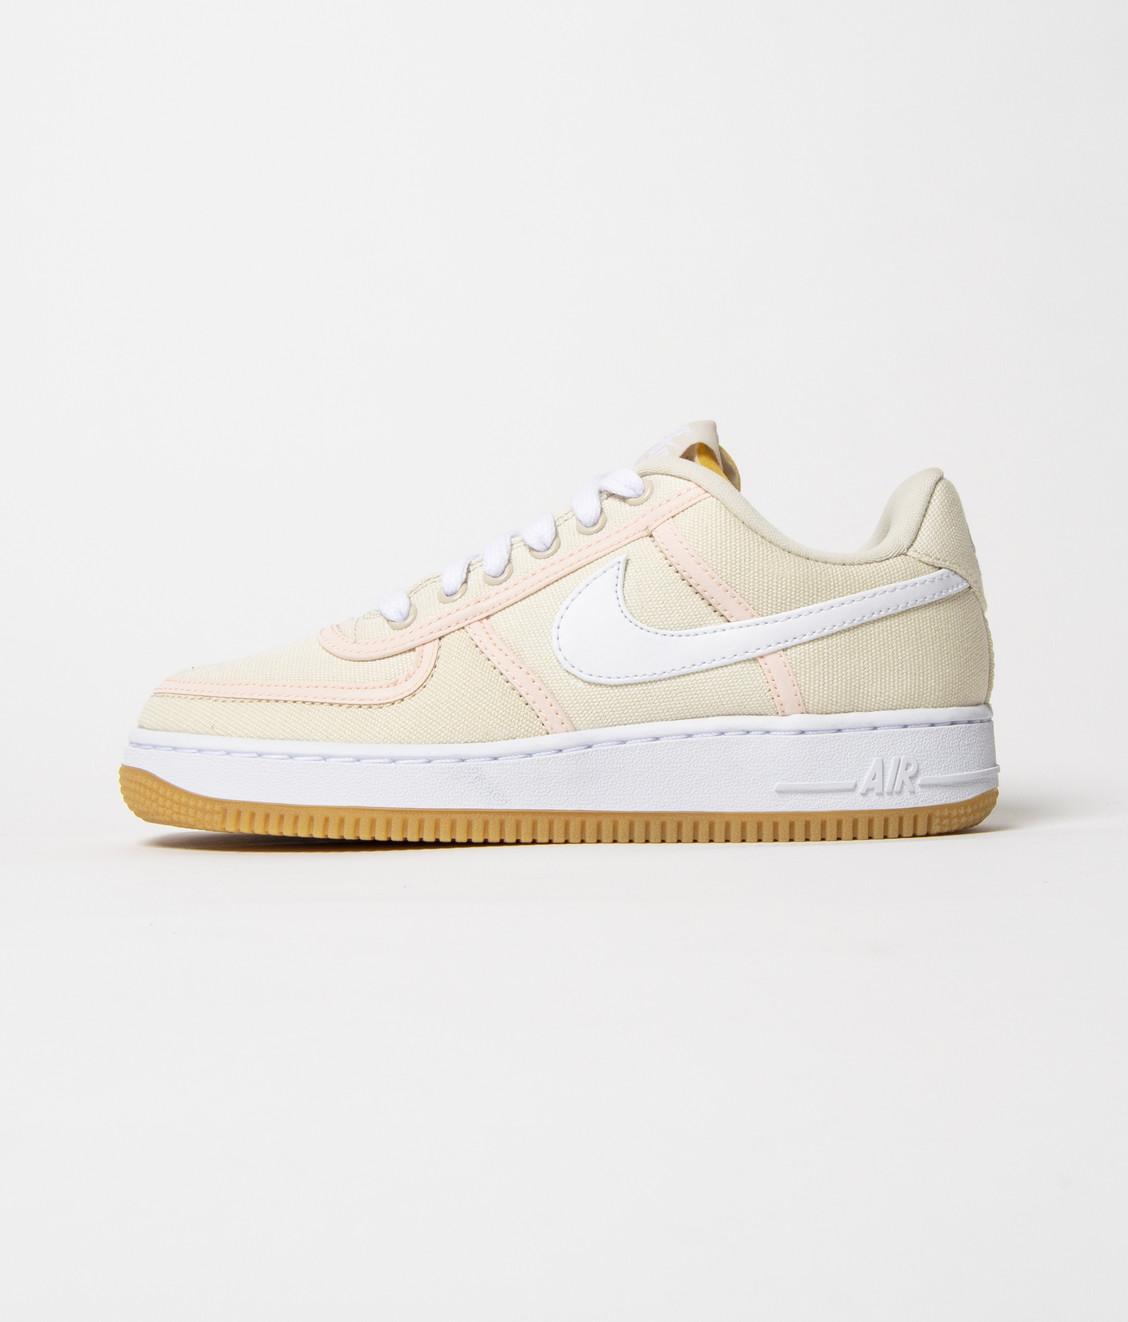 Nike Nike Air Force 1 07 Prm Light Cream Canvas